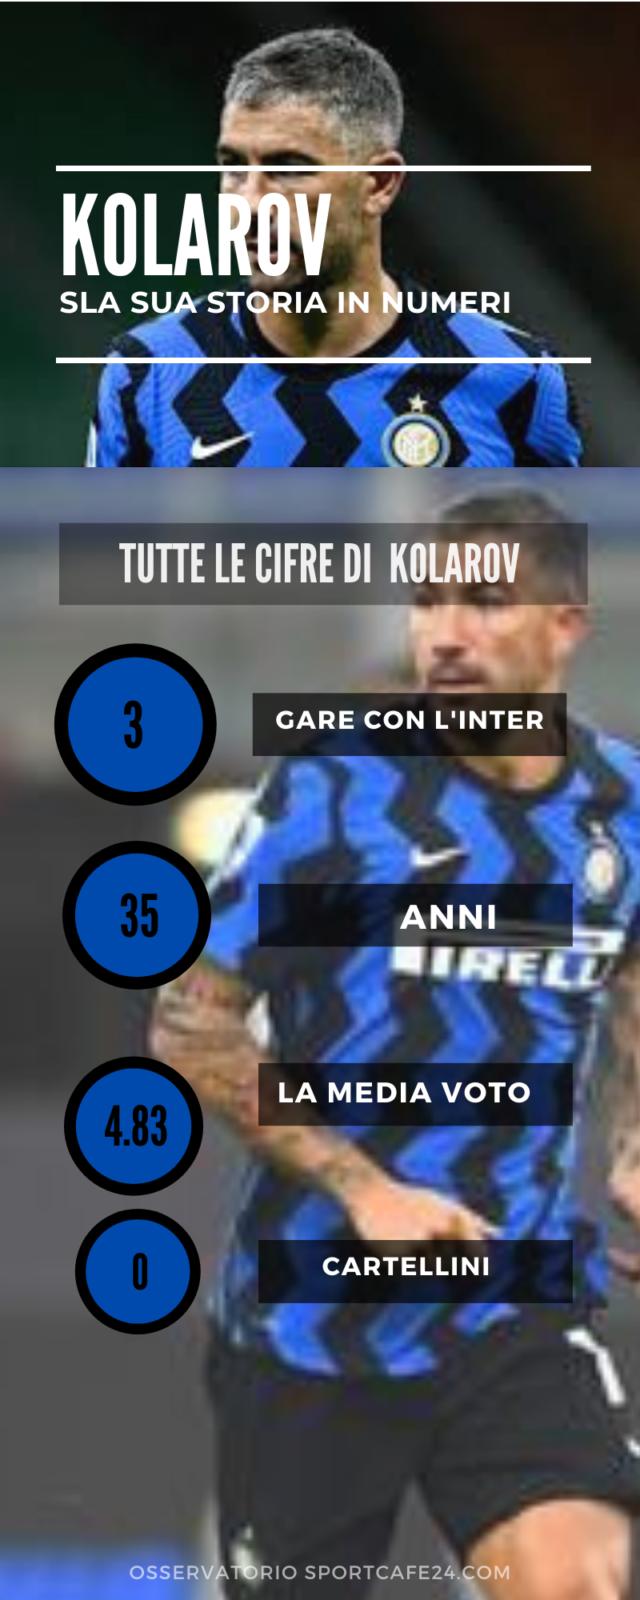 Kolarov-Saelemaekers: gli stili diversi di Inter e Milan